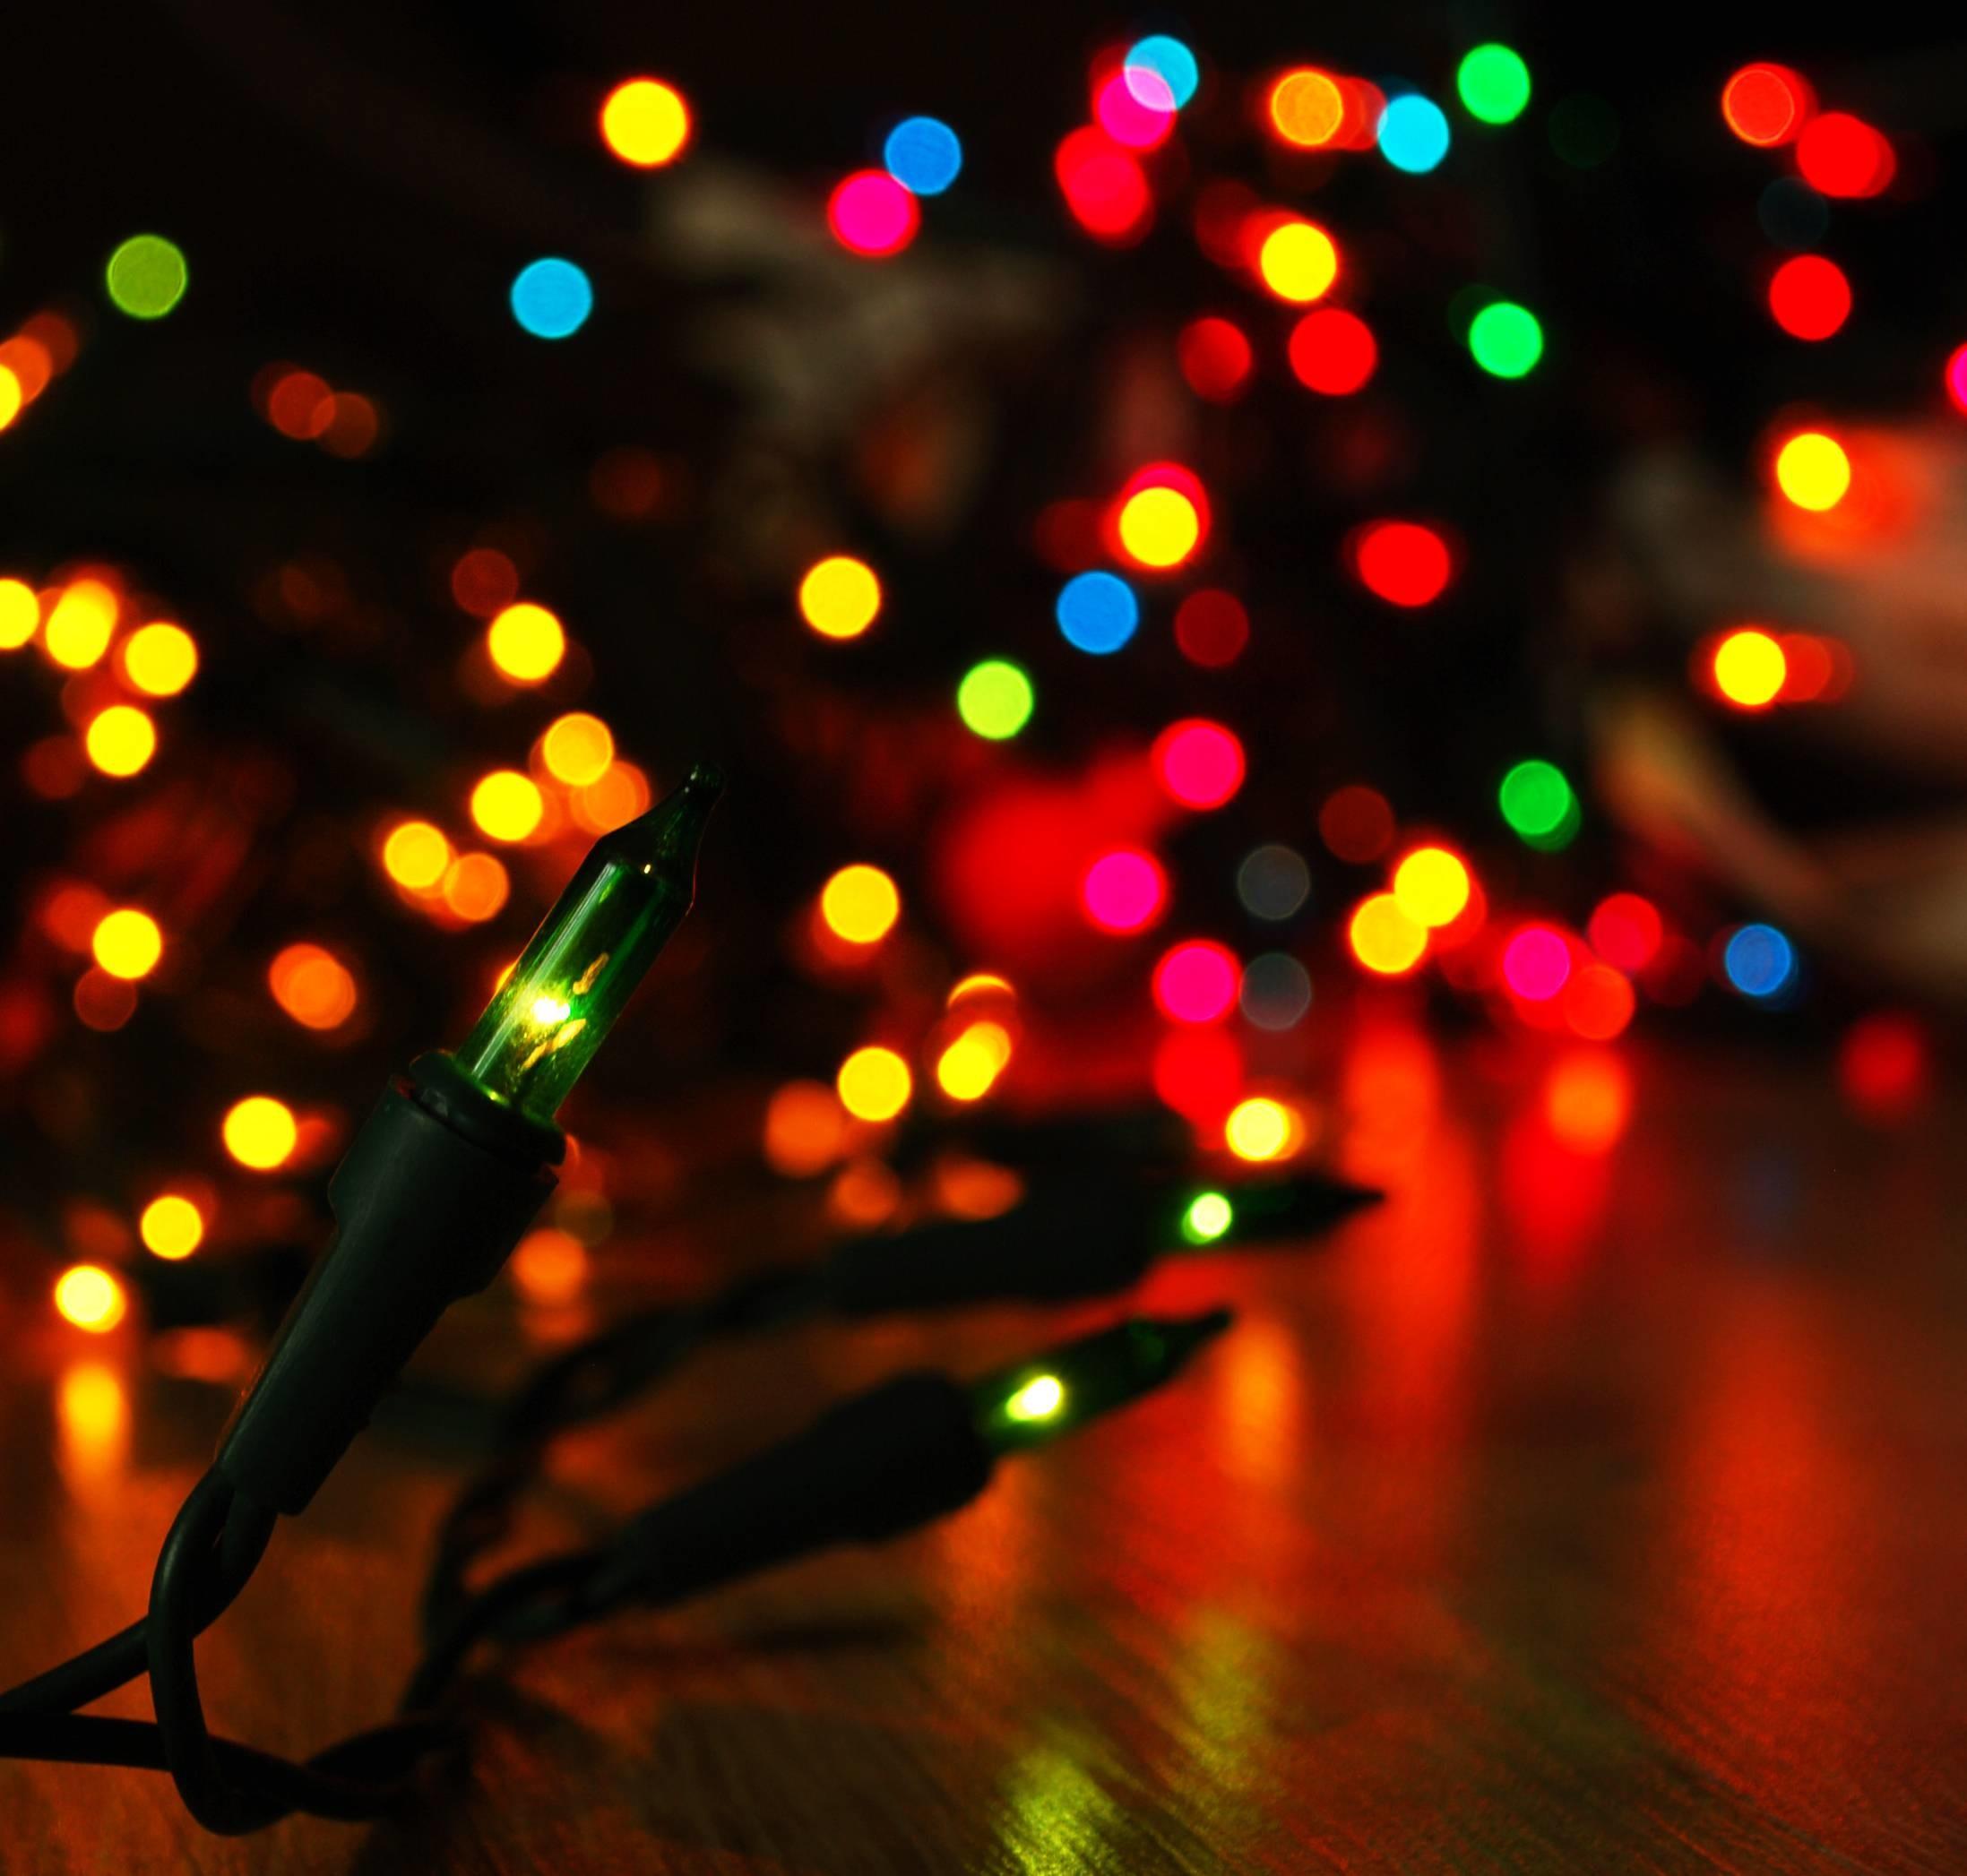 Wallpapers For > Christmas Tree Lights Desktop Background